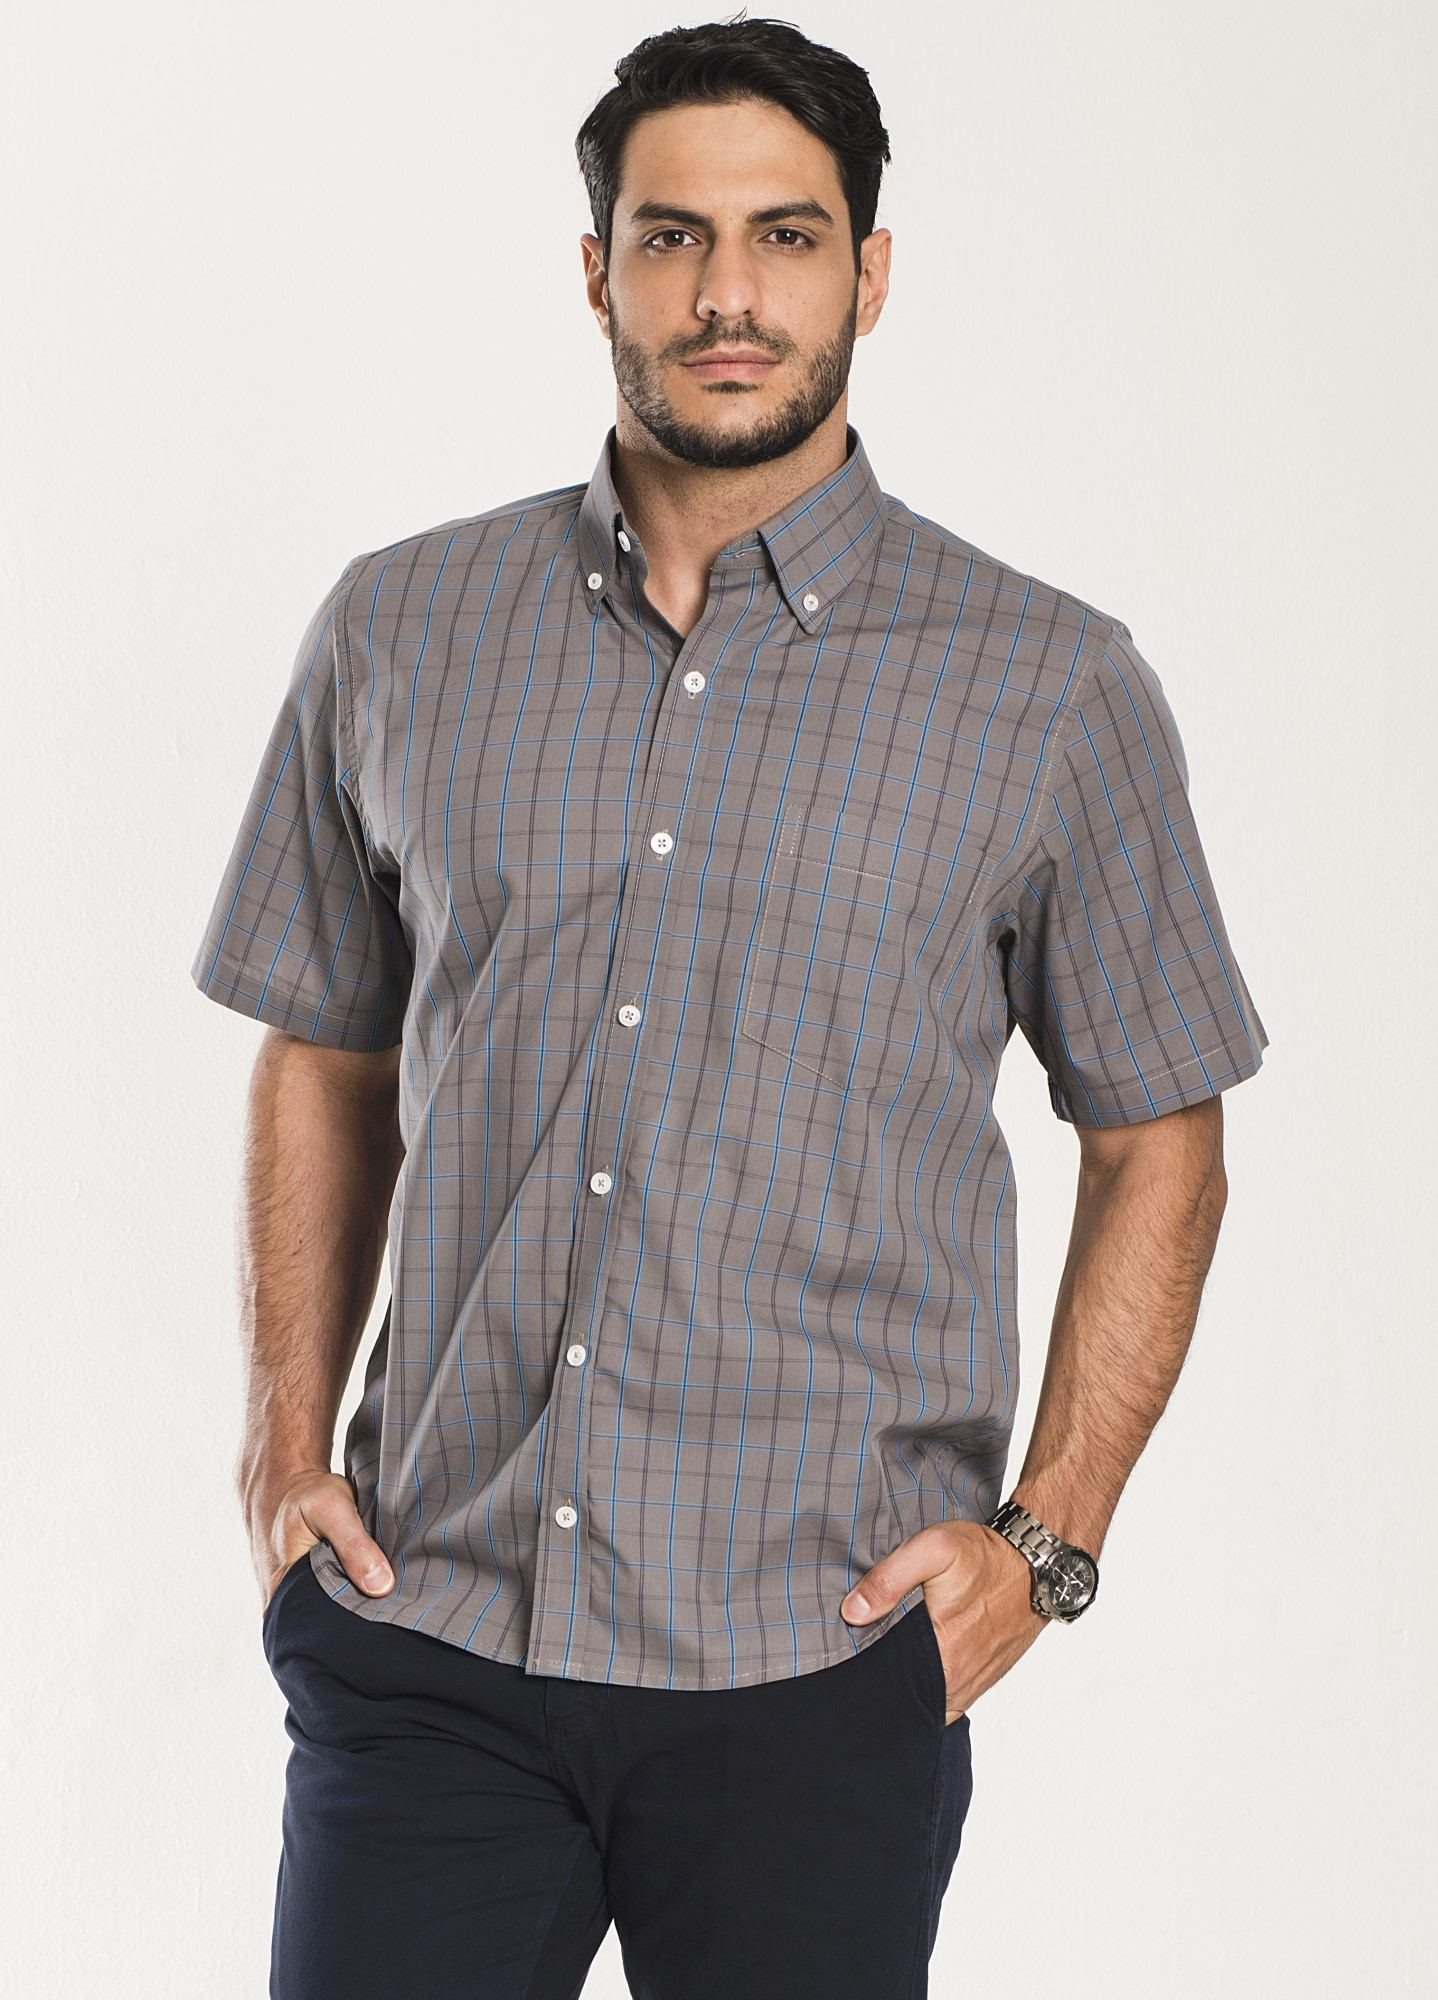 Camisa Xadrez Manga Curta Cinza e Azul